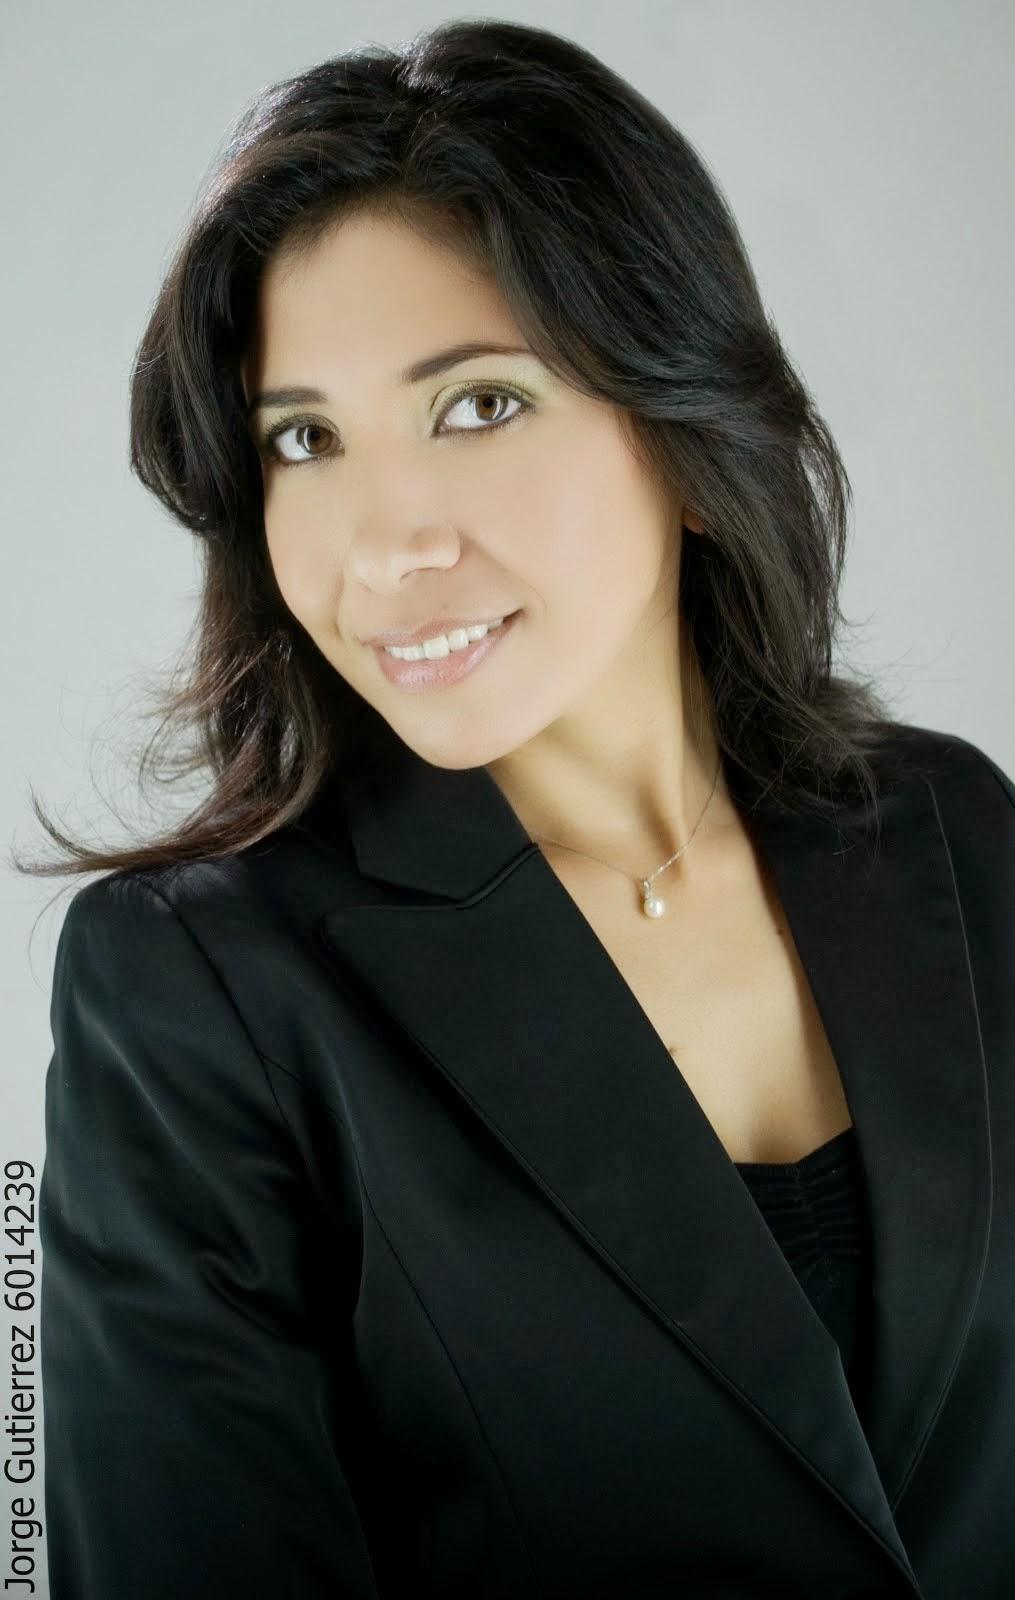 S. Mariela Méndez Prado